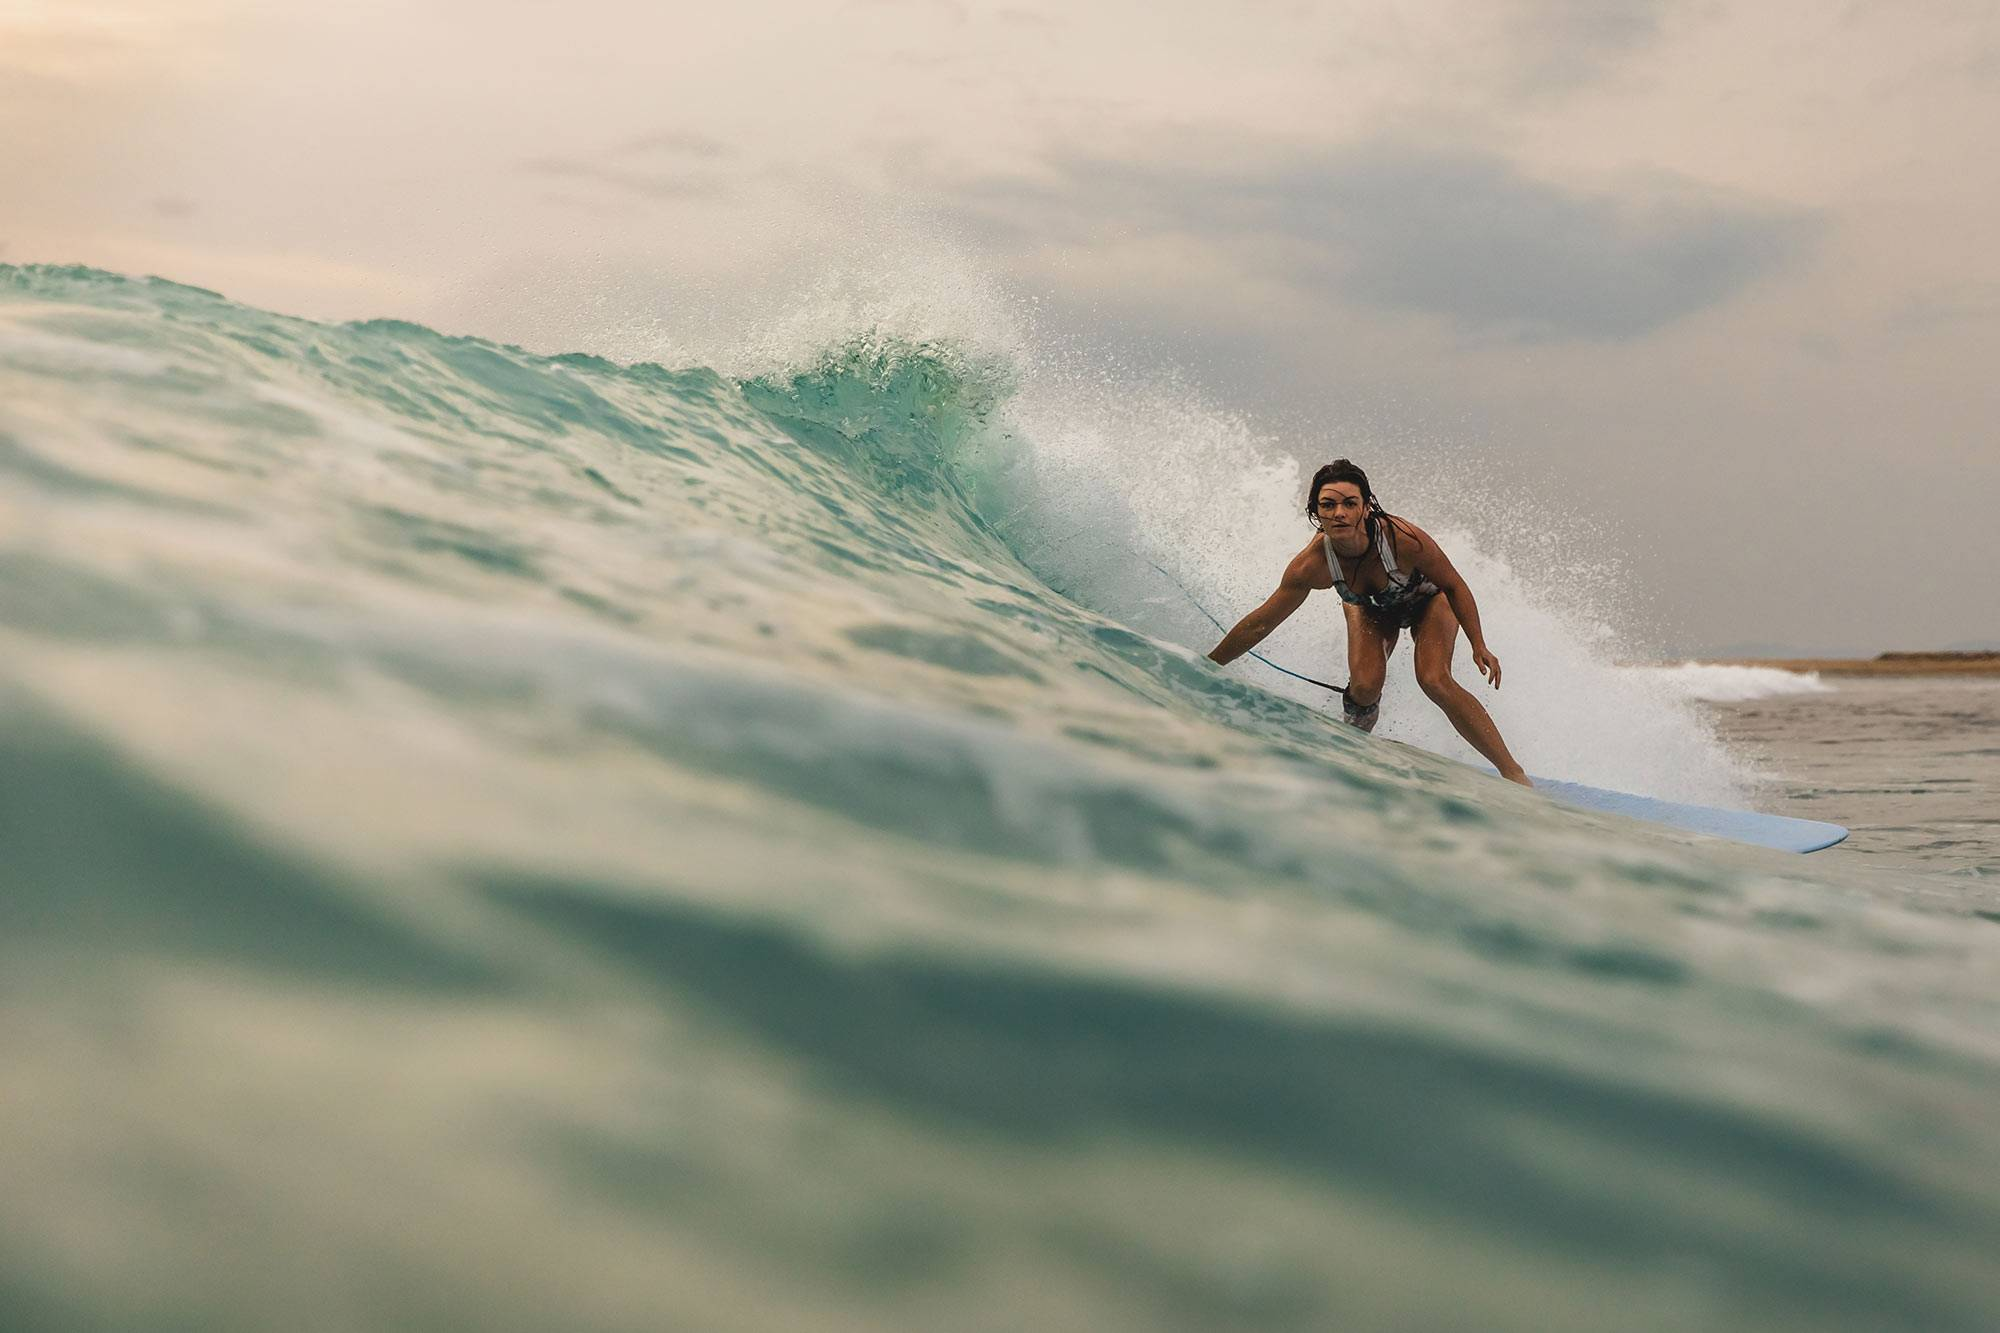 https://www.soulandsurf.com/wp-content/uploads/2021/08/lombok-pop-up-2019-Copy-of-Lombok-pop-up-surf-@peterchamberlainphoto.DJI_I11A3678.jpg Image